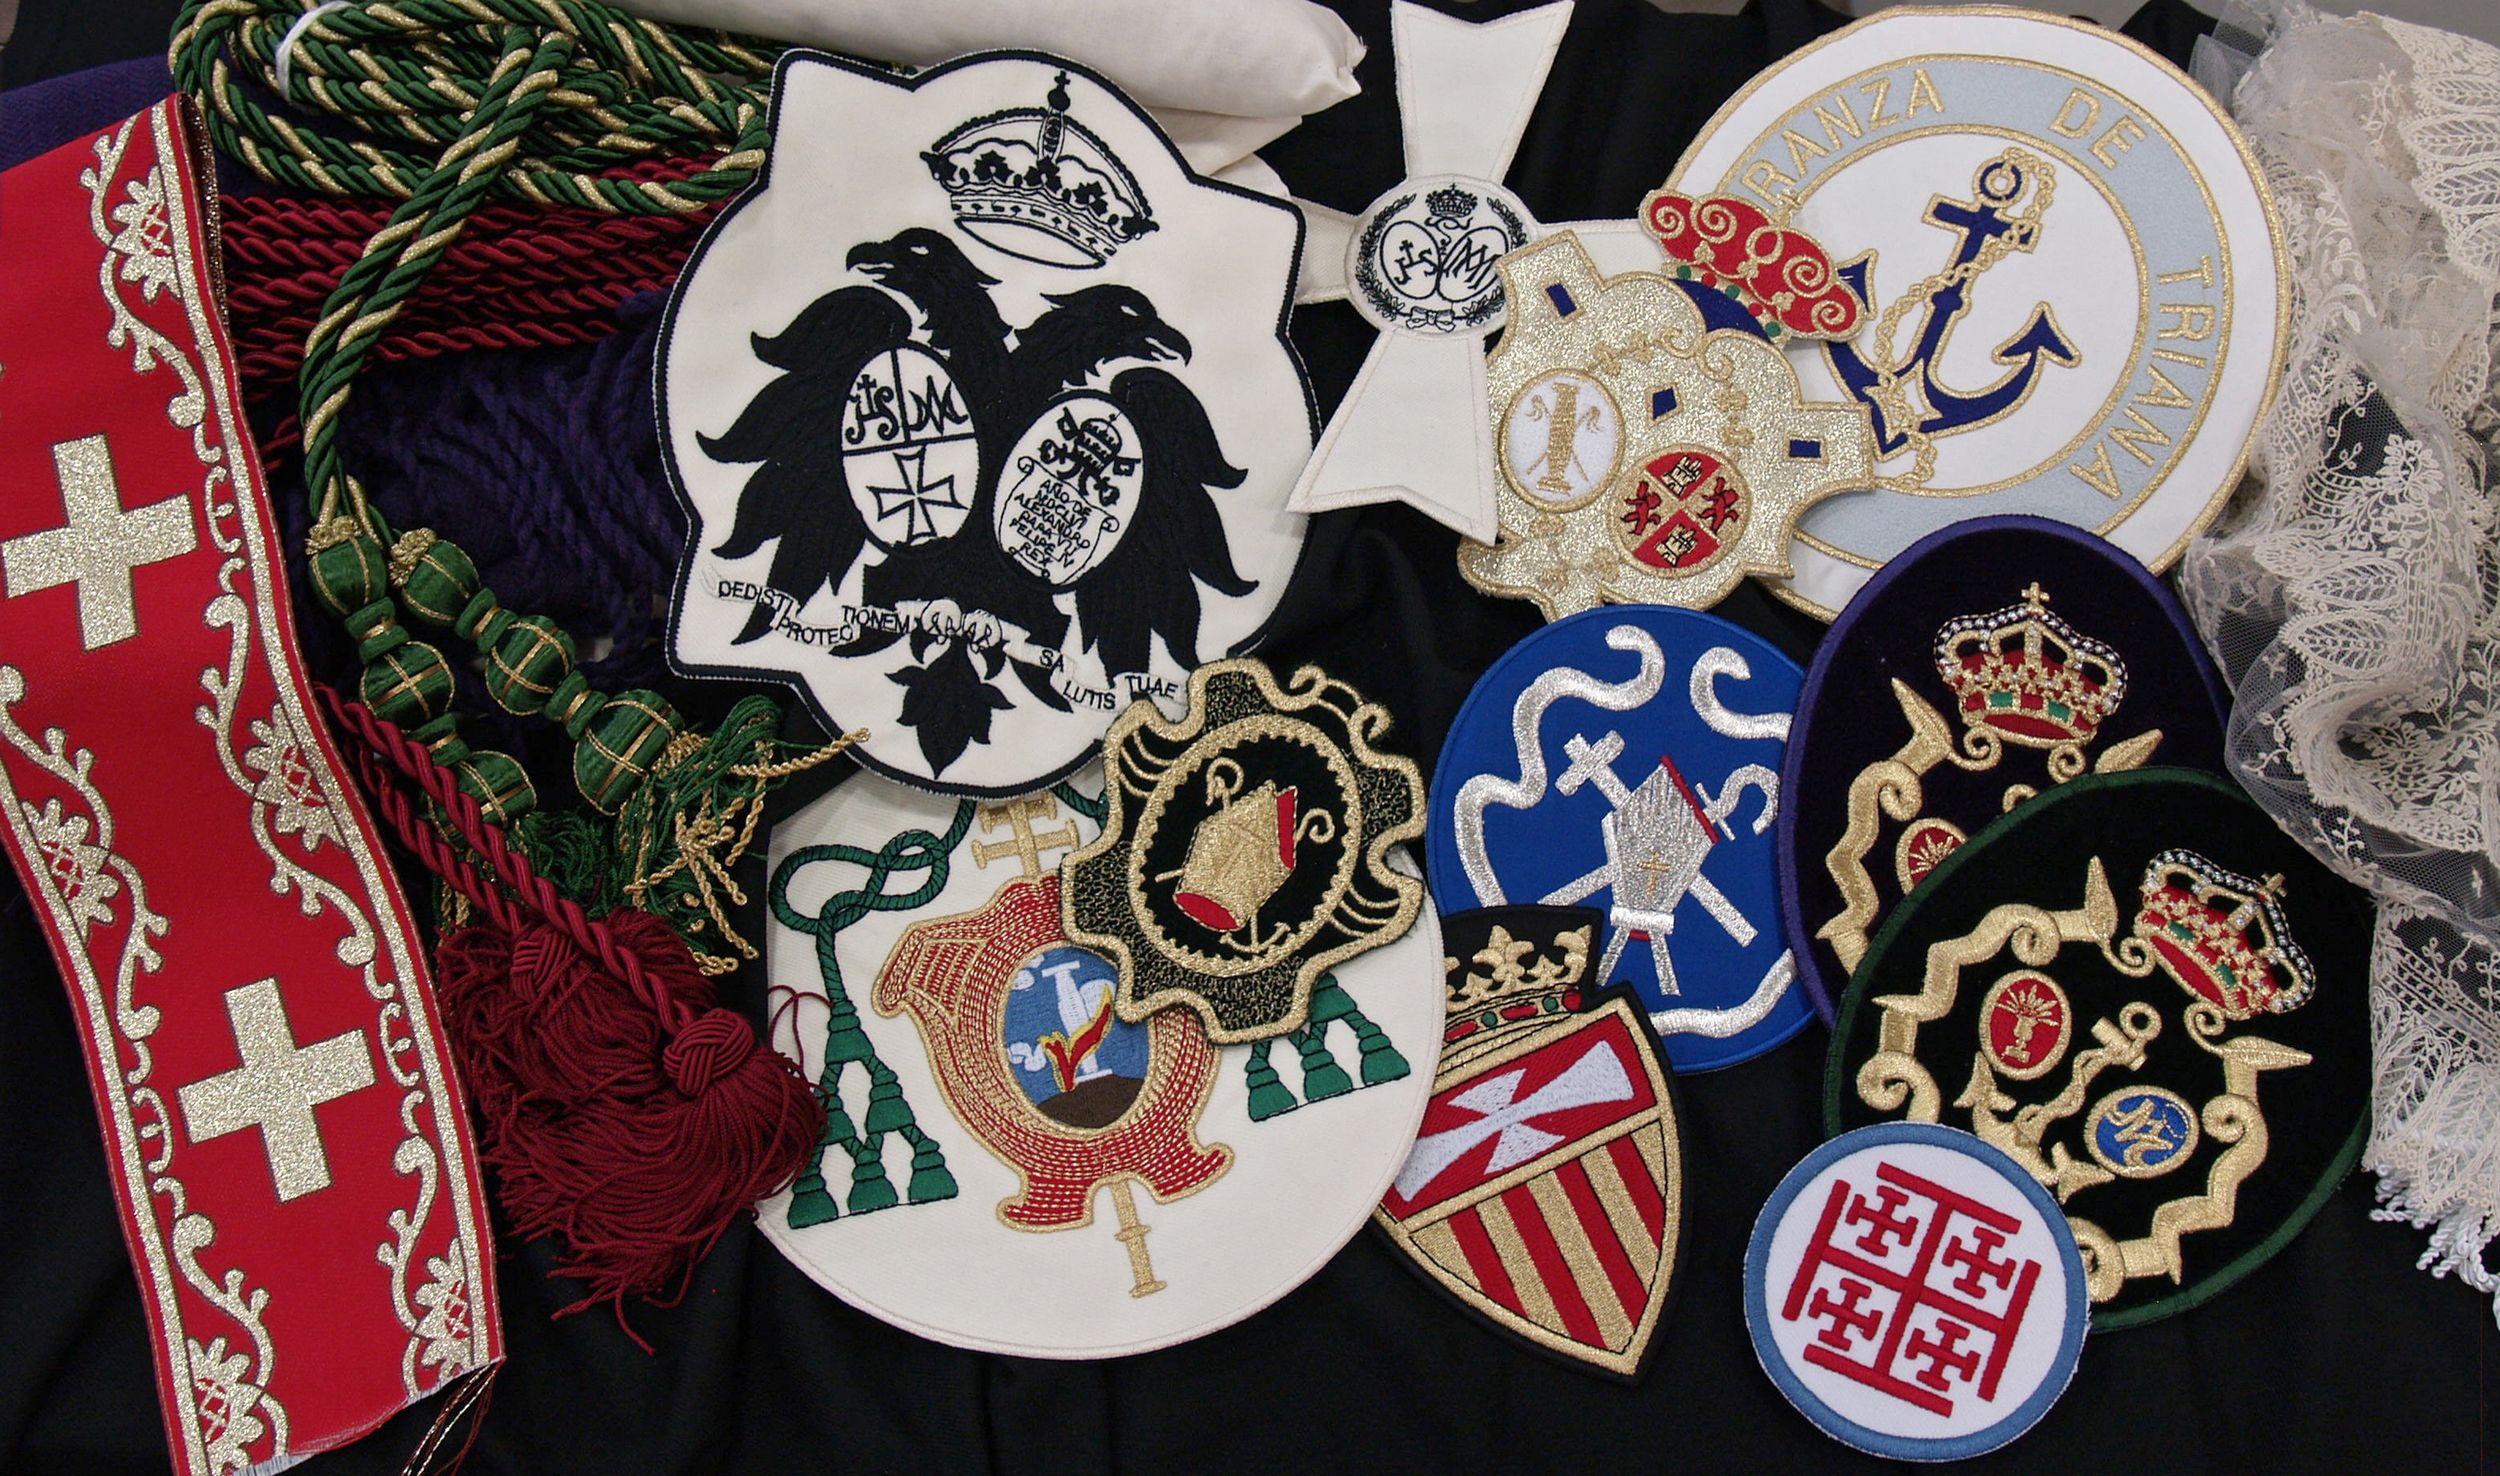 Venta de complementos para hermandades en Sevilla